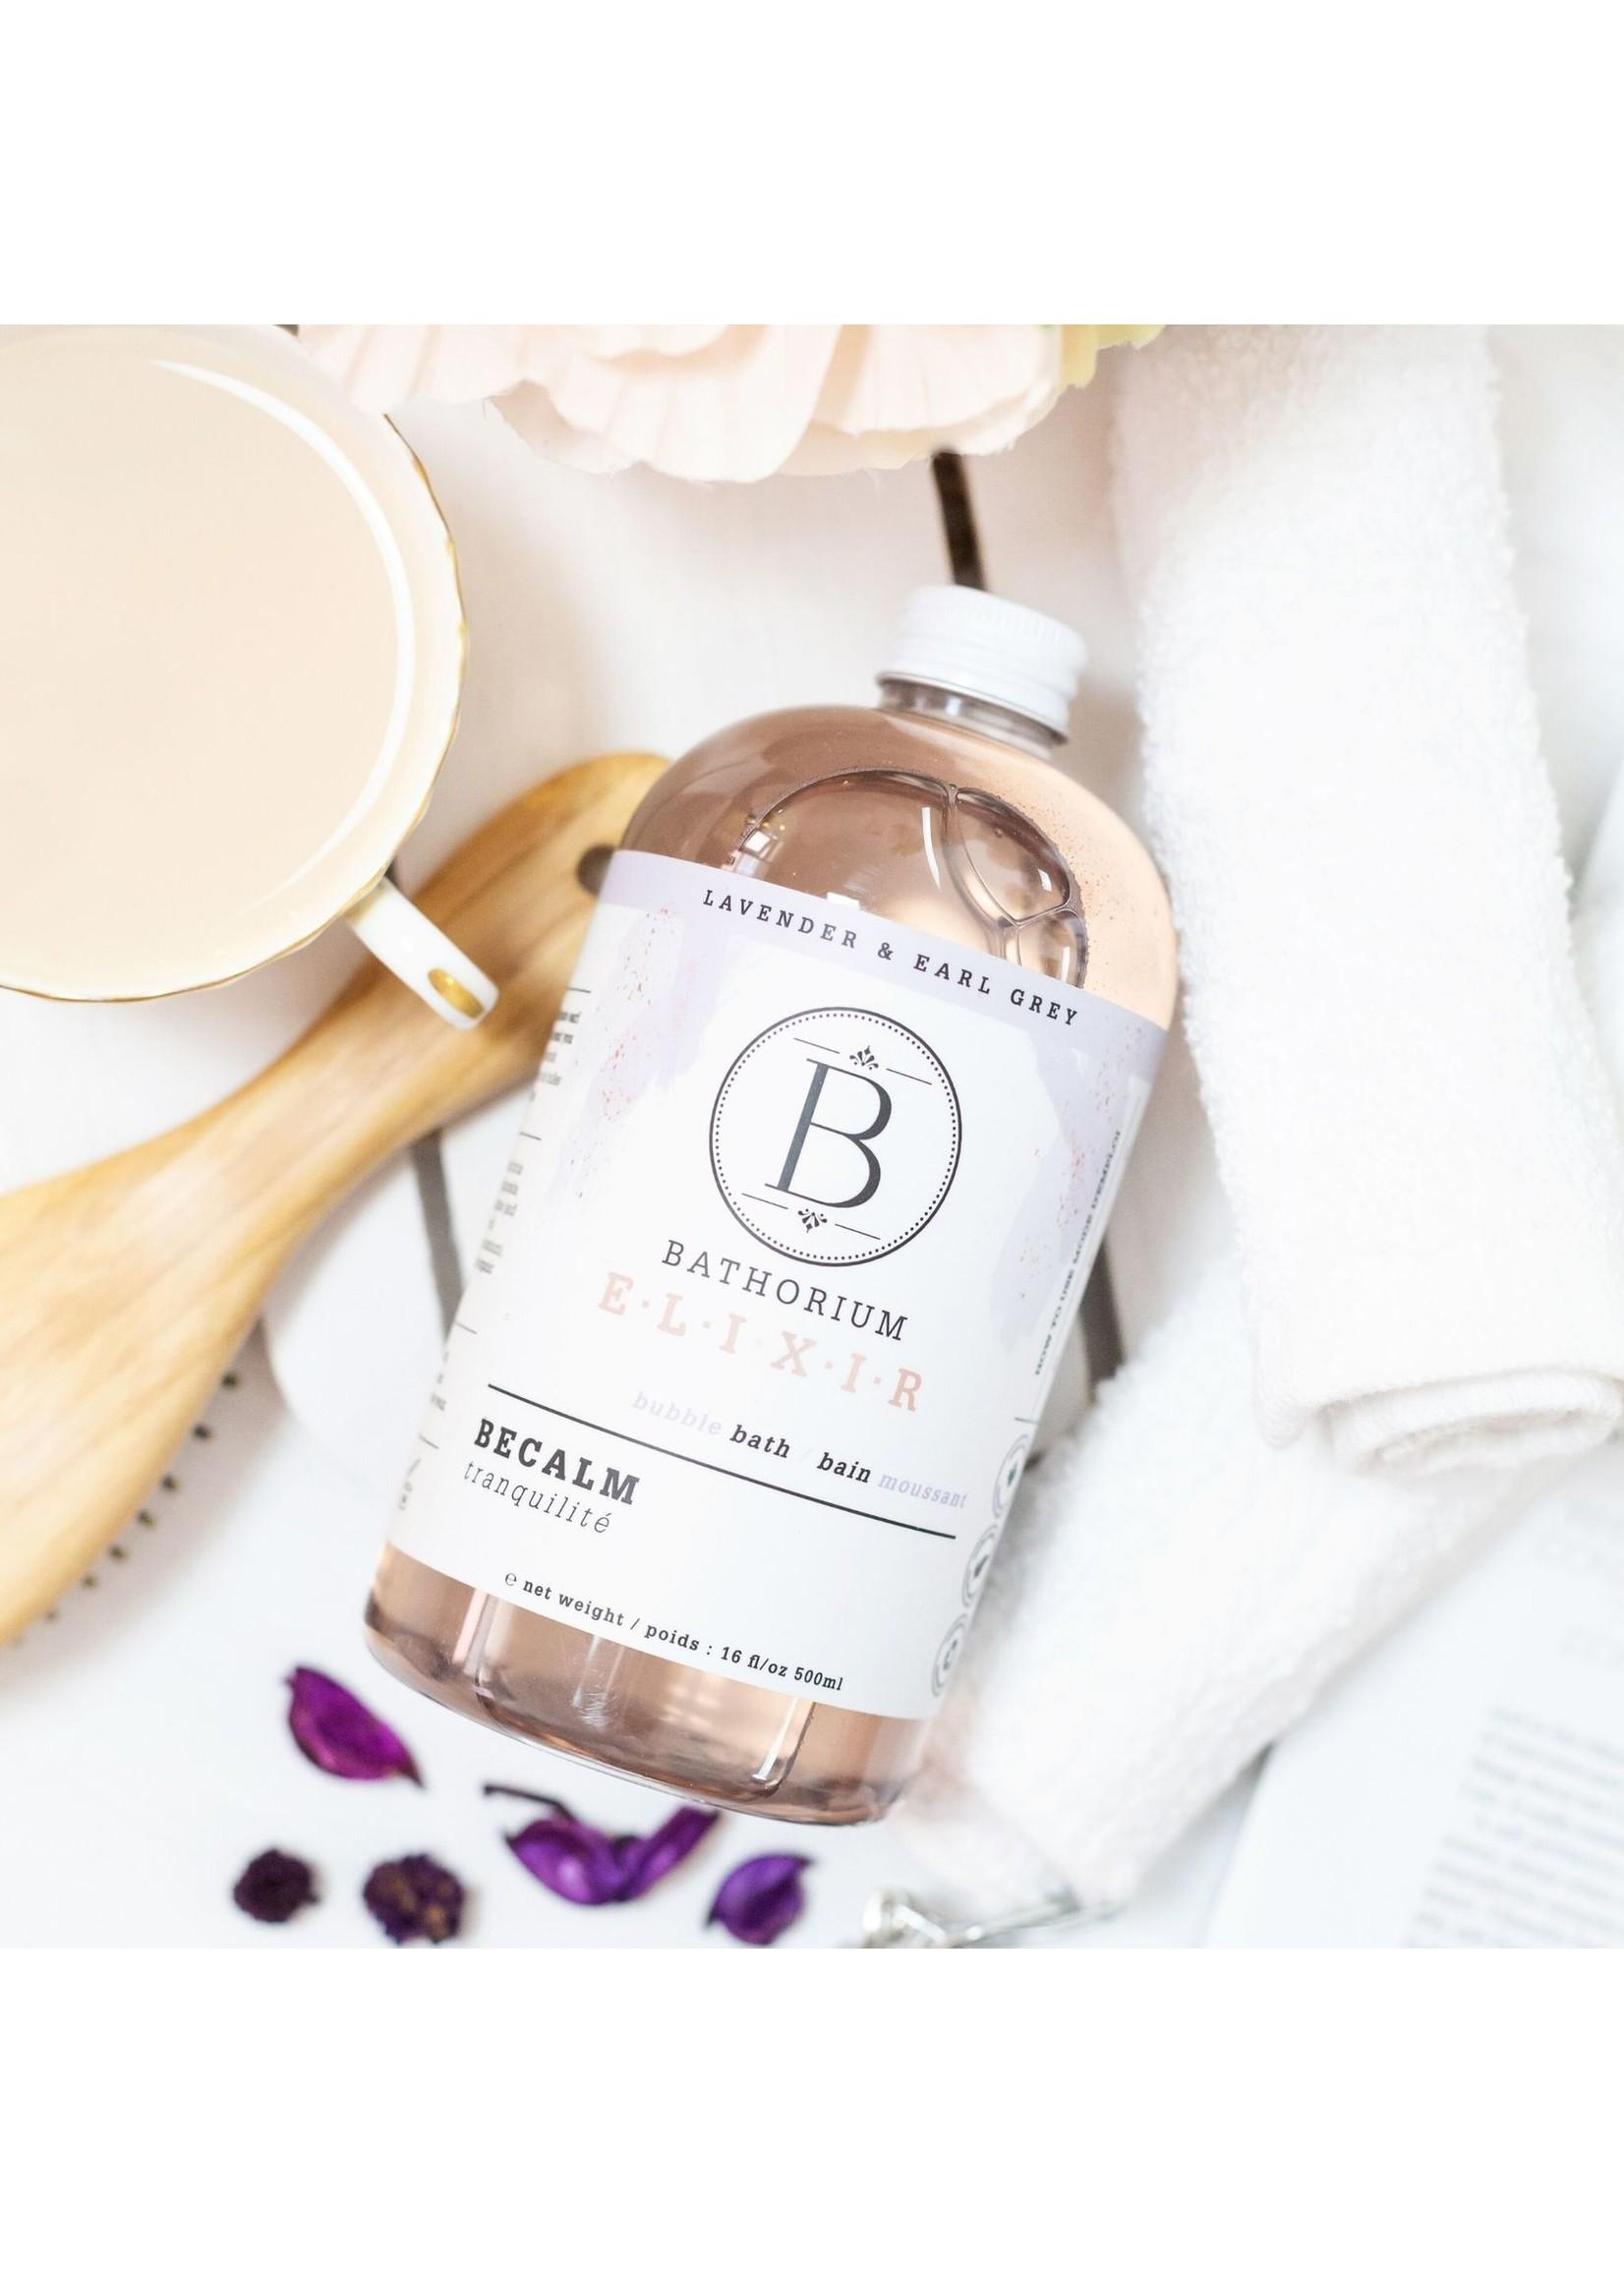 Bathorium BeCalm Elixir